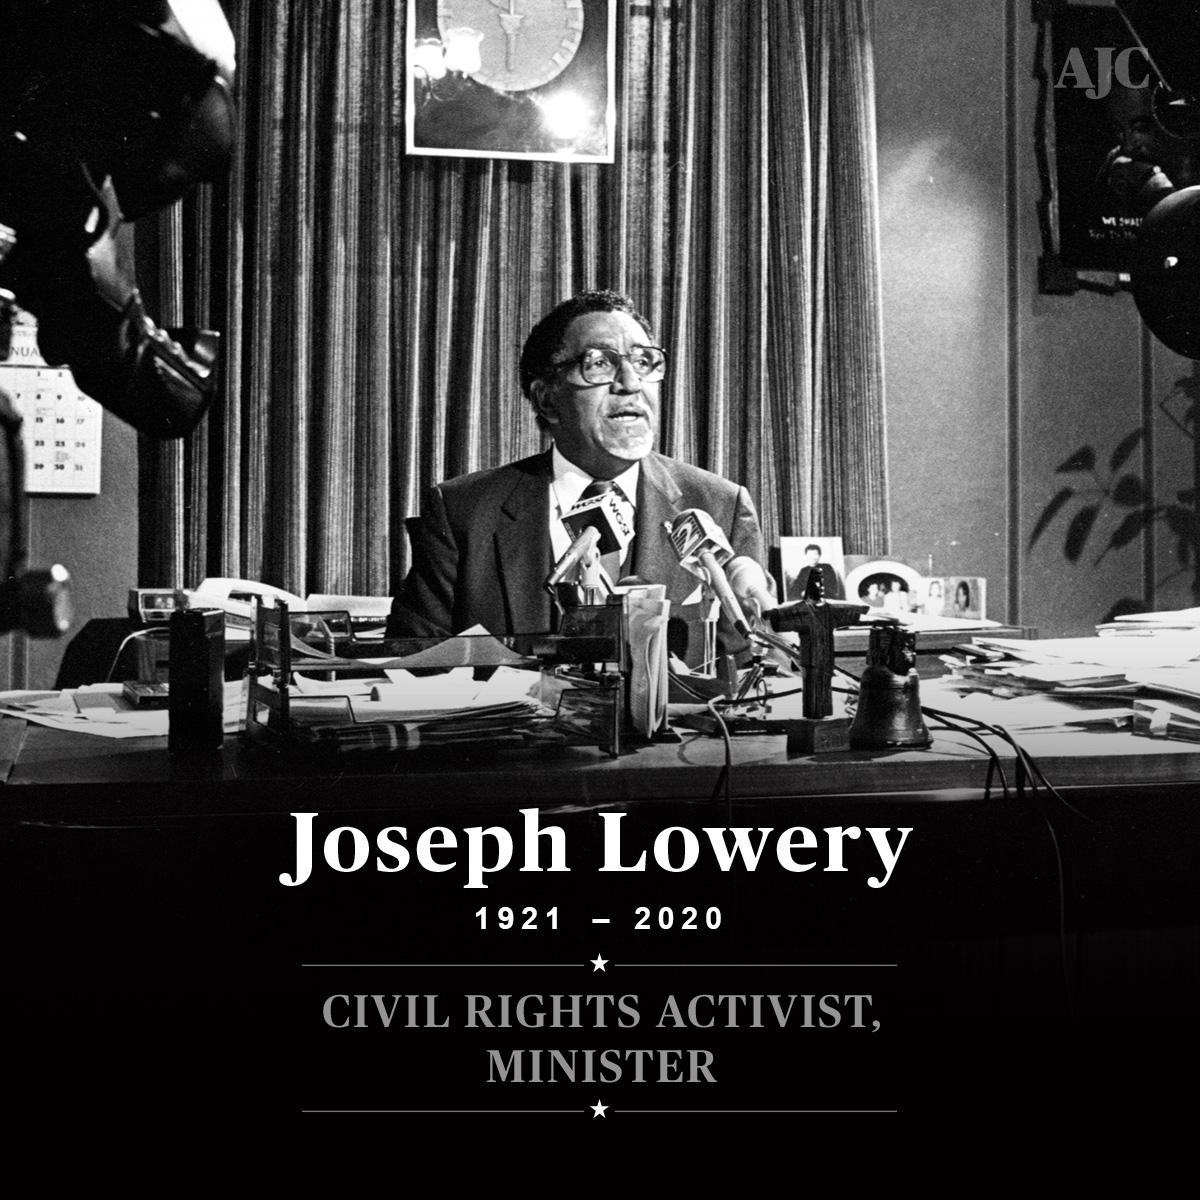 Remembering the Rev. Joseph Lowery bit.ly/2WNFTtT